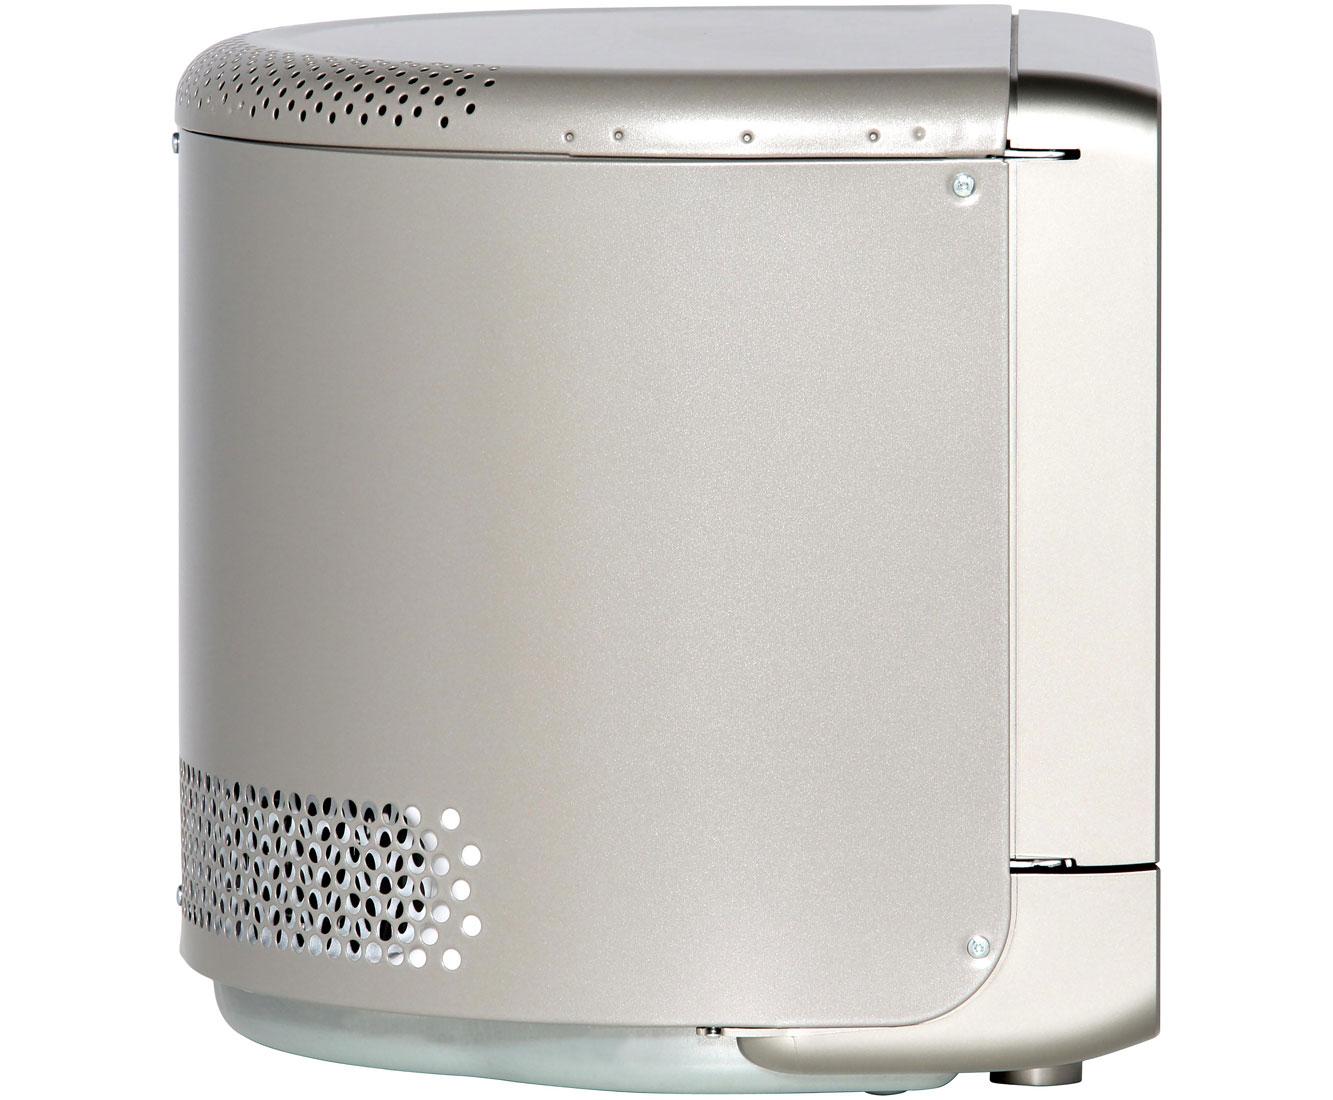 Whirlpool Max34sl Mikrowelle 13 Liter 700 Watt Silber